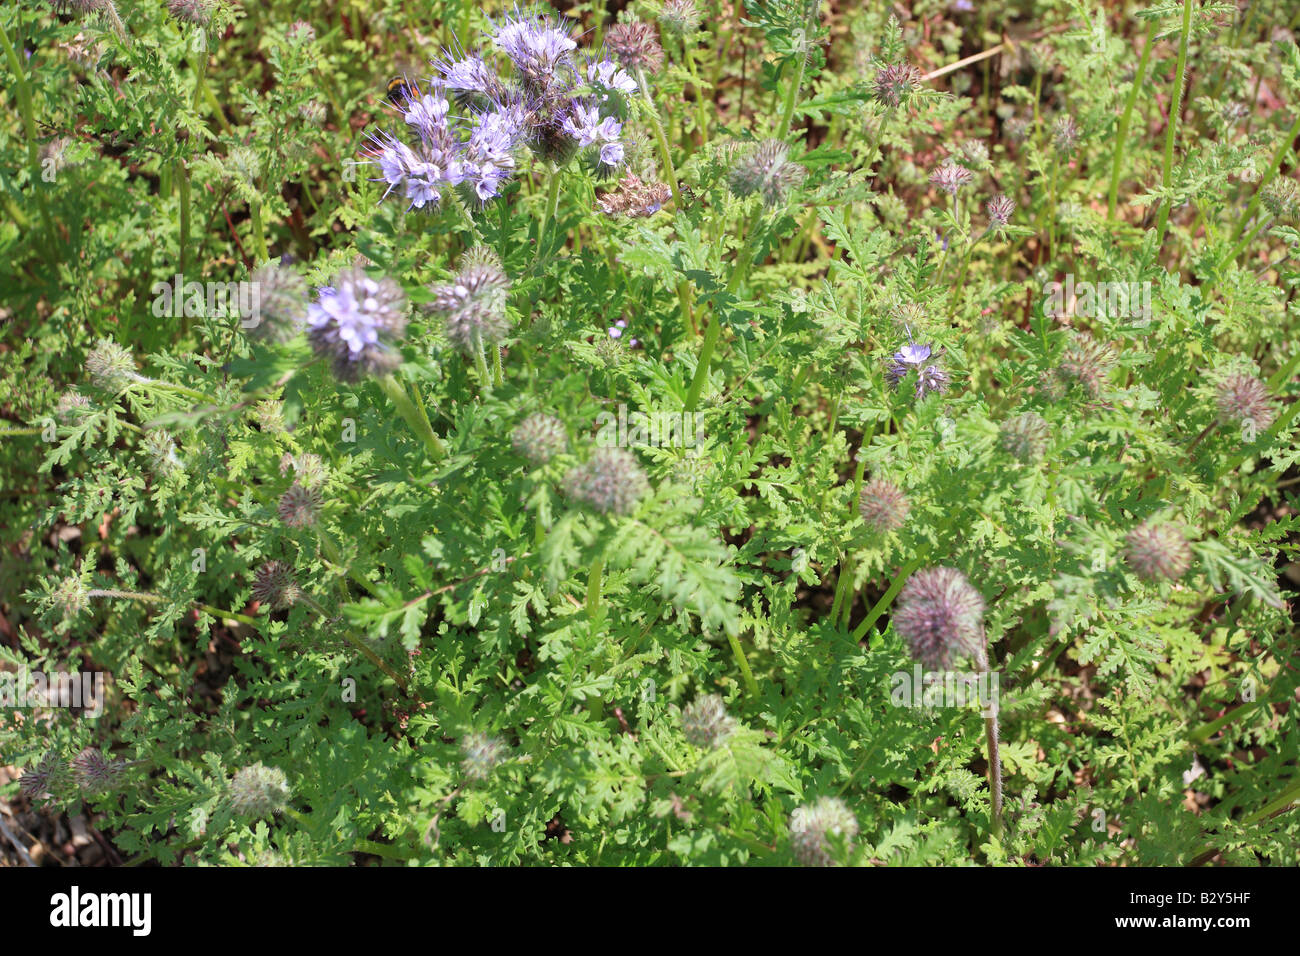 PHACELIA Phacelia tanicefolia PLANTS GROWING IN BED FOR GREEN MANURE Stock Photo